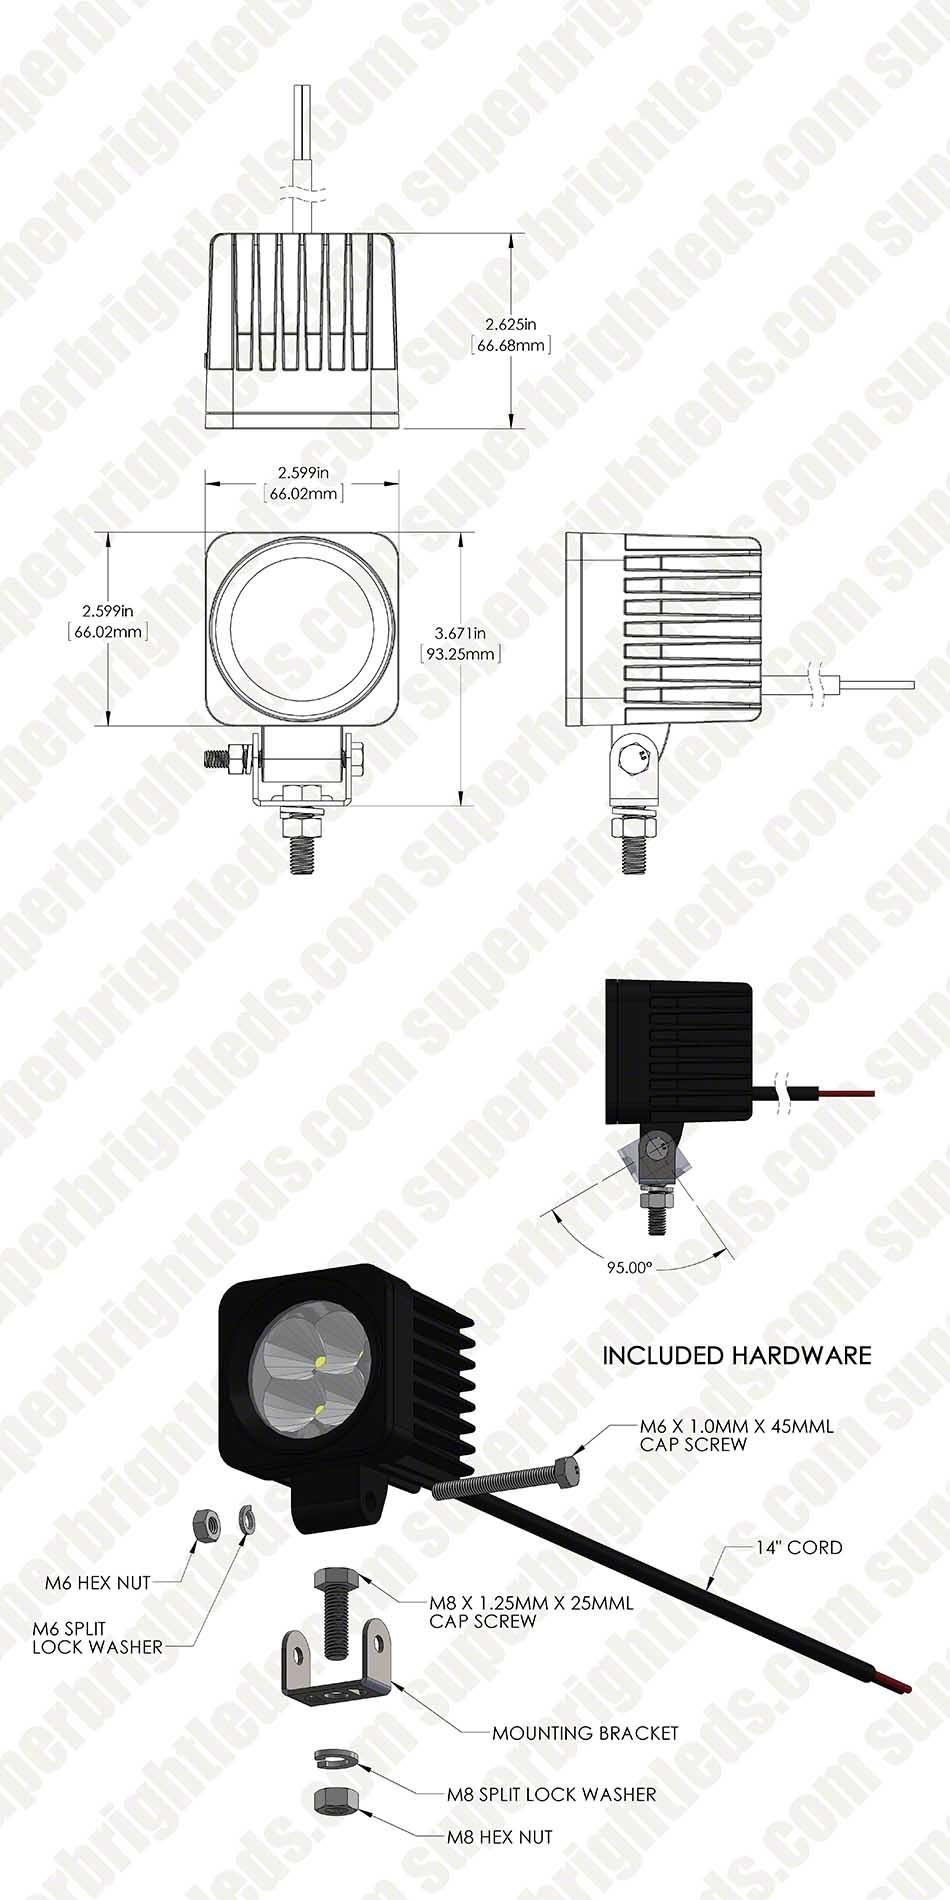 aux 12w s30 assembly digimark led boat light 2\